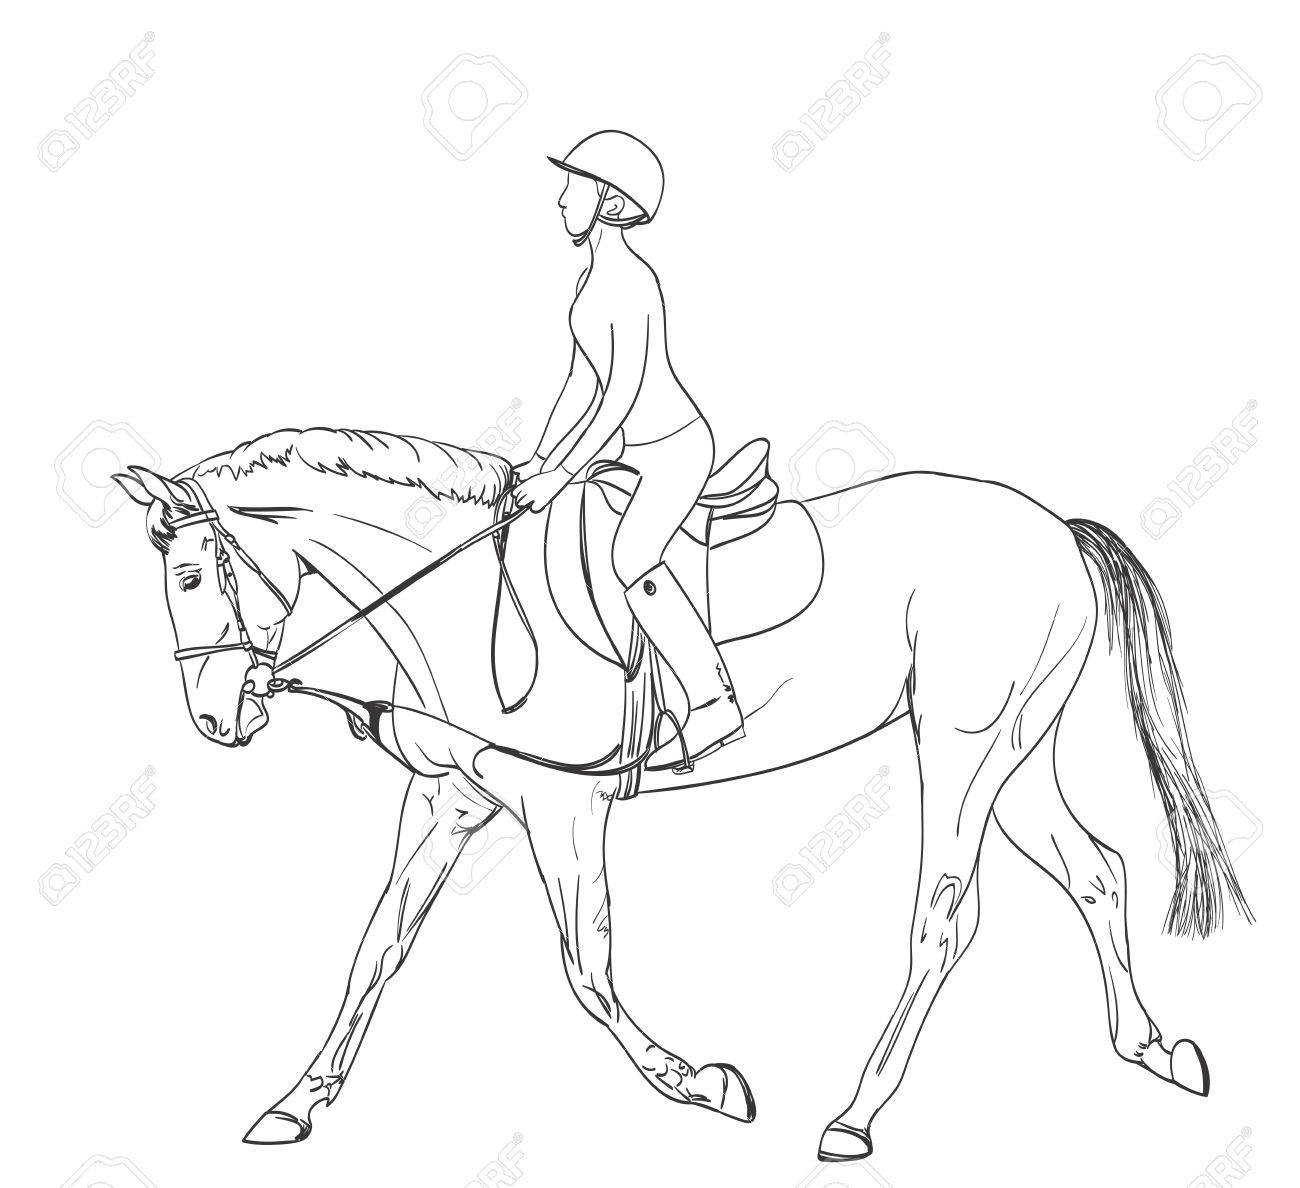 horse rider line art drawing. equestrian sport training theme illustration. vector - 62142074